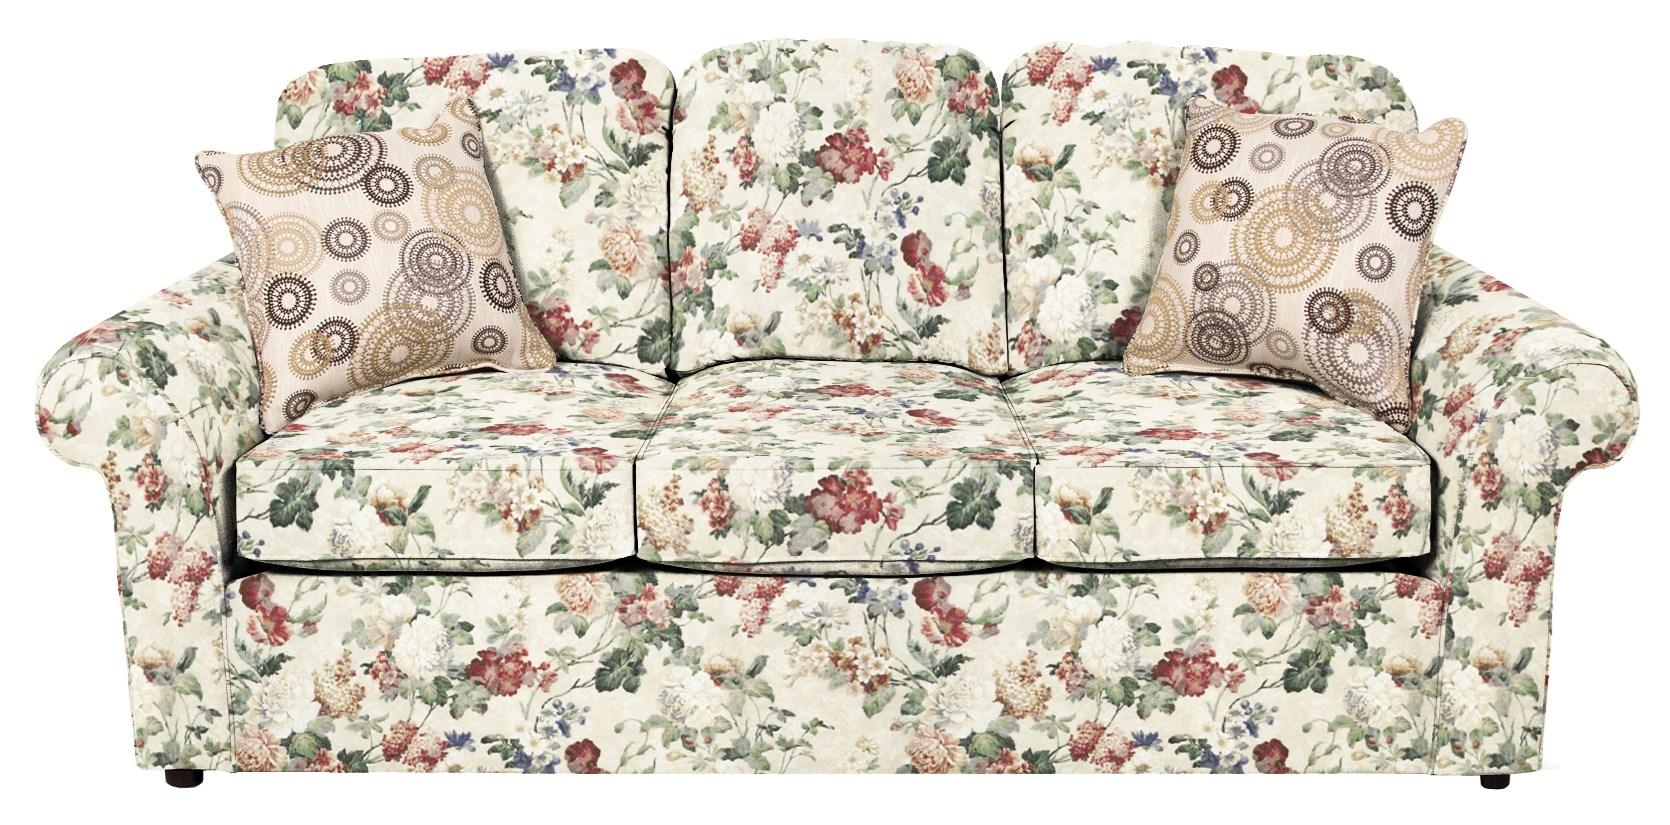 Malibu Sofa by England at Lapeer Furniture & Mattress Center